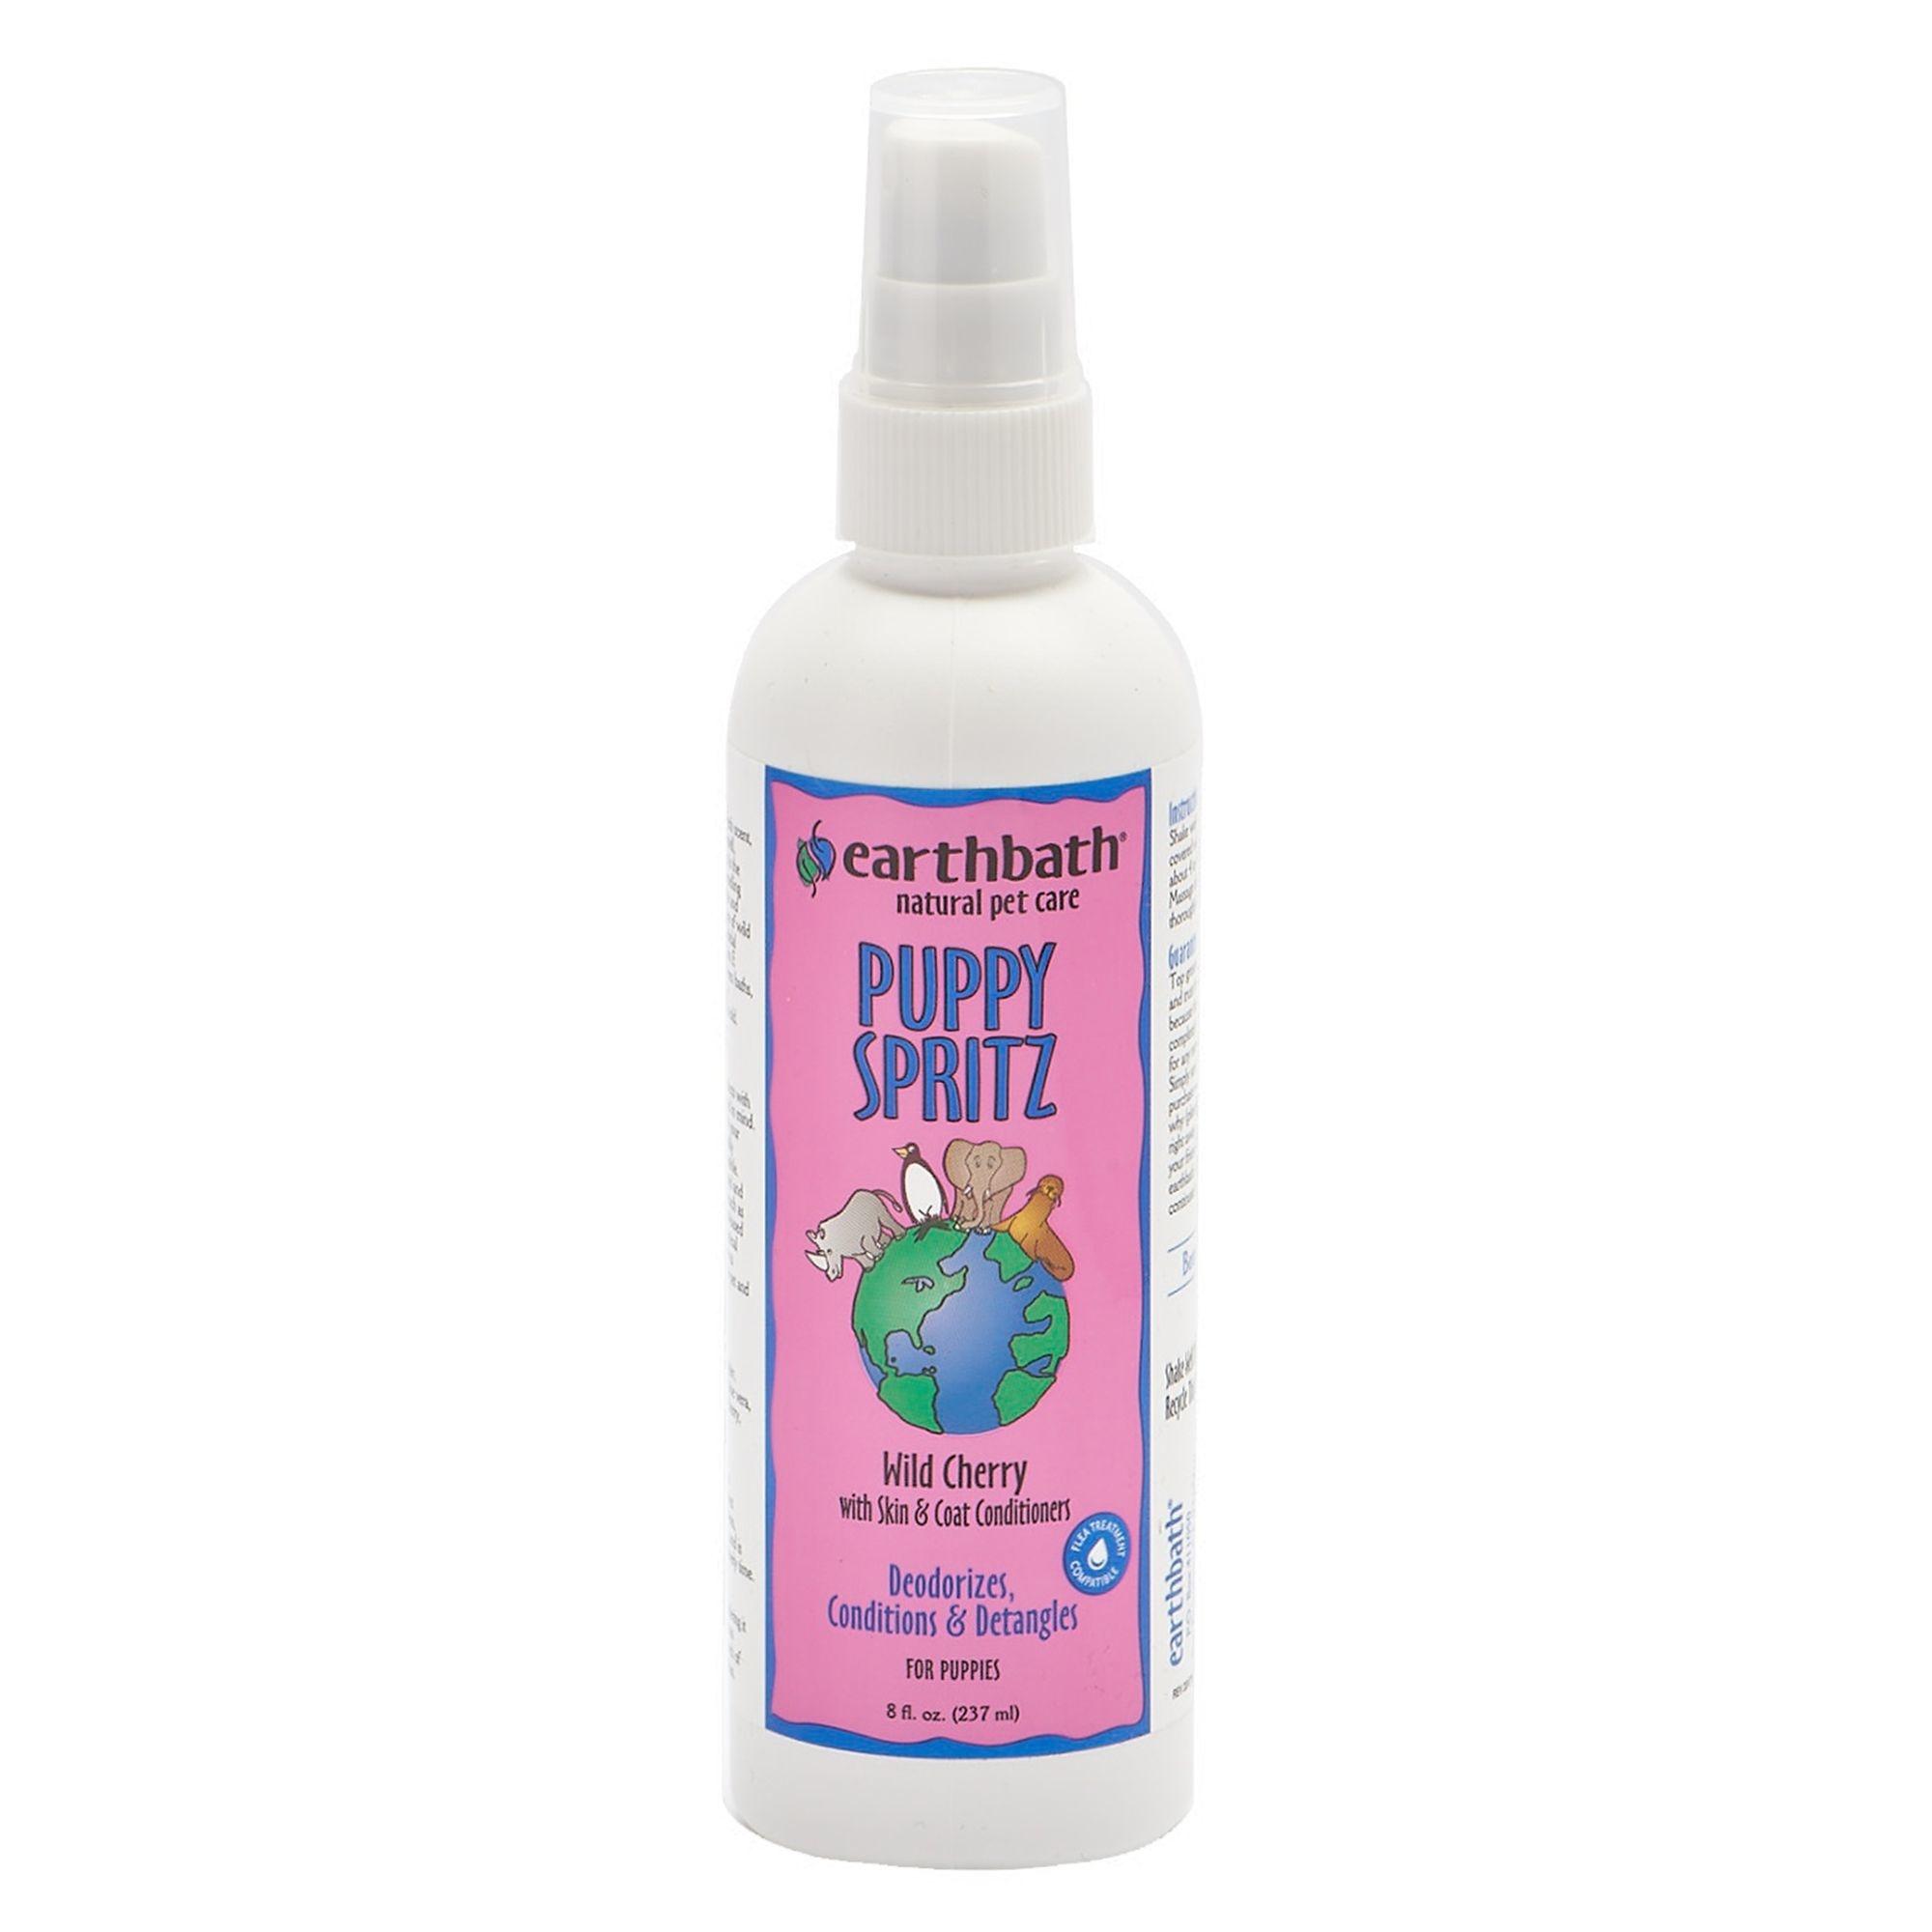 Earthbath Earthbath 3-in-1 Wild Cherry Puppy Deodorizing Spritz 8oz